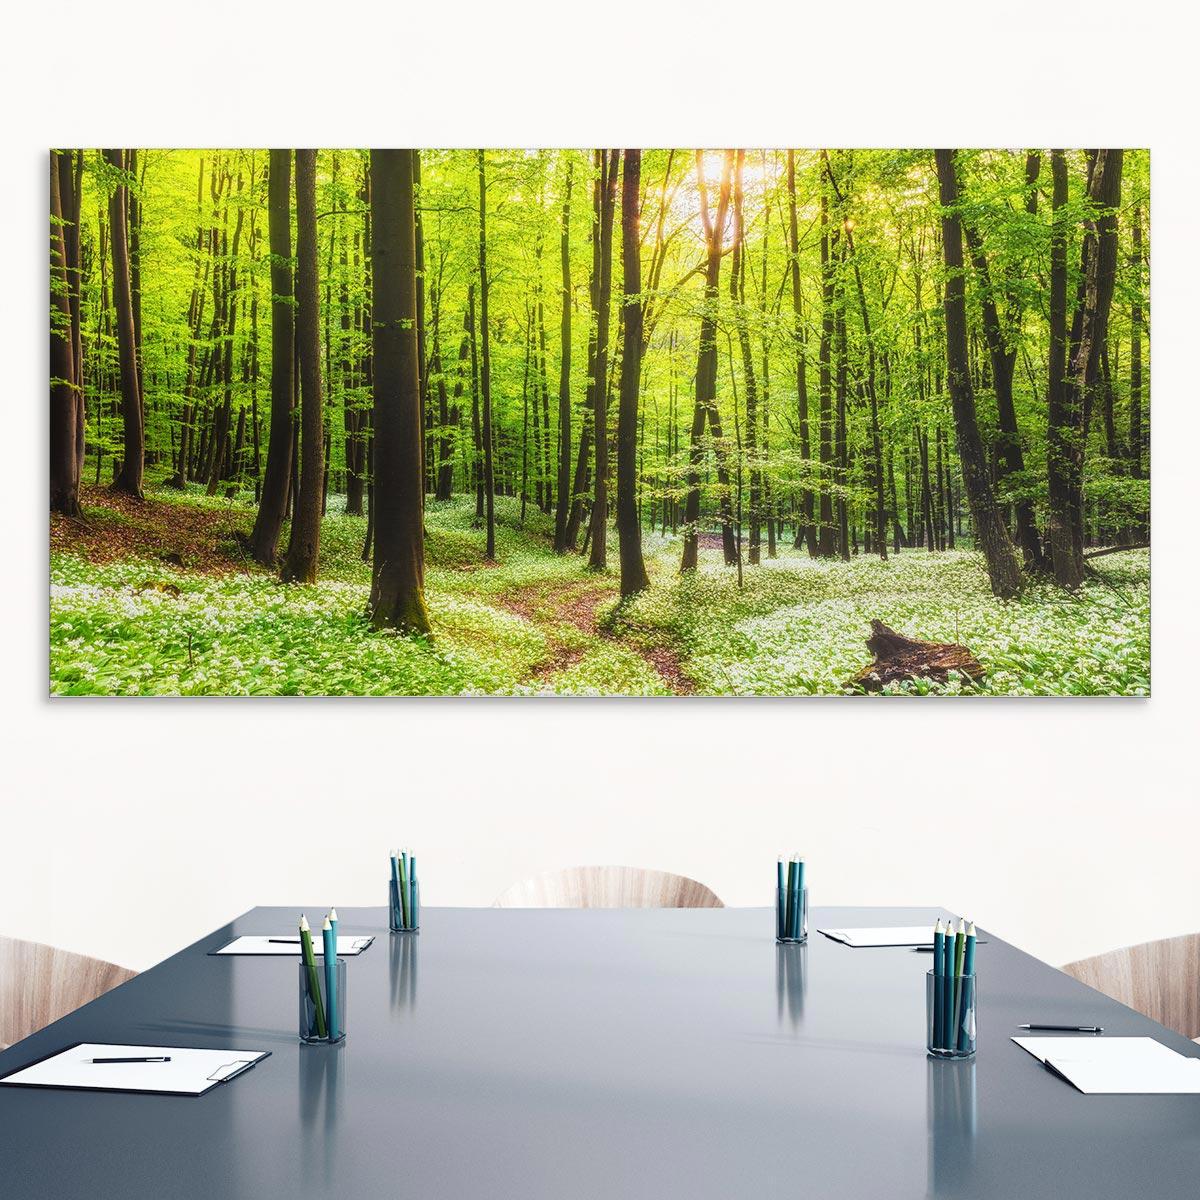 Akustikbild Wald, einseitig, Wandmontage